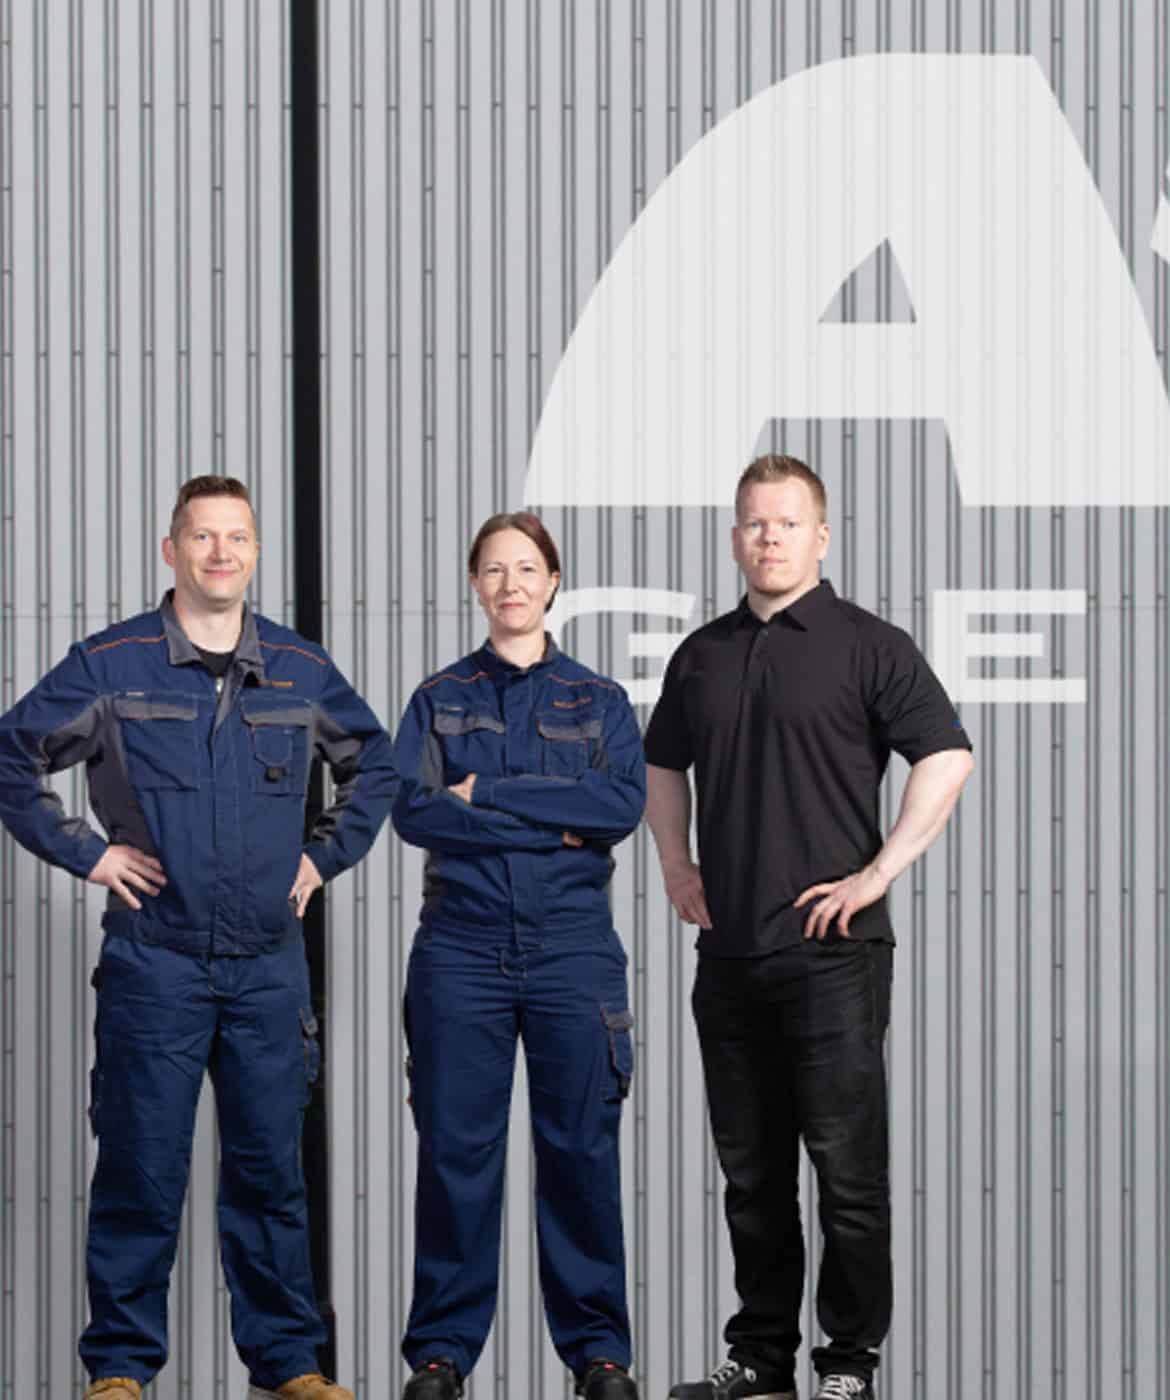 Professionals talk - blog and news - Ata Gears